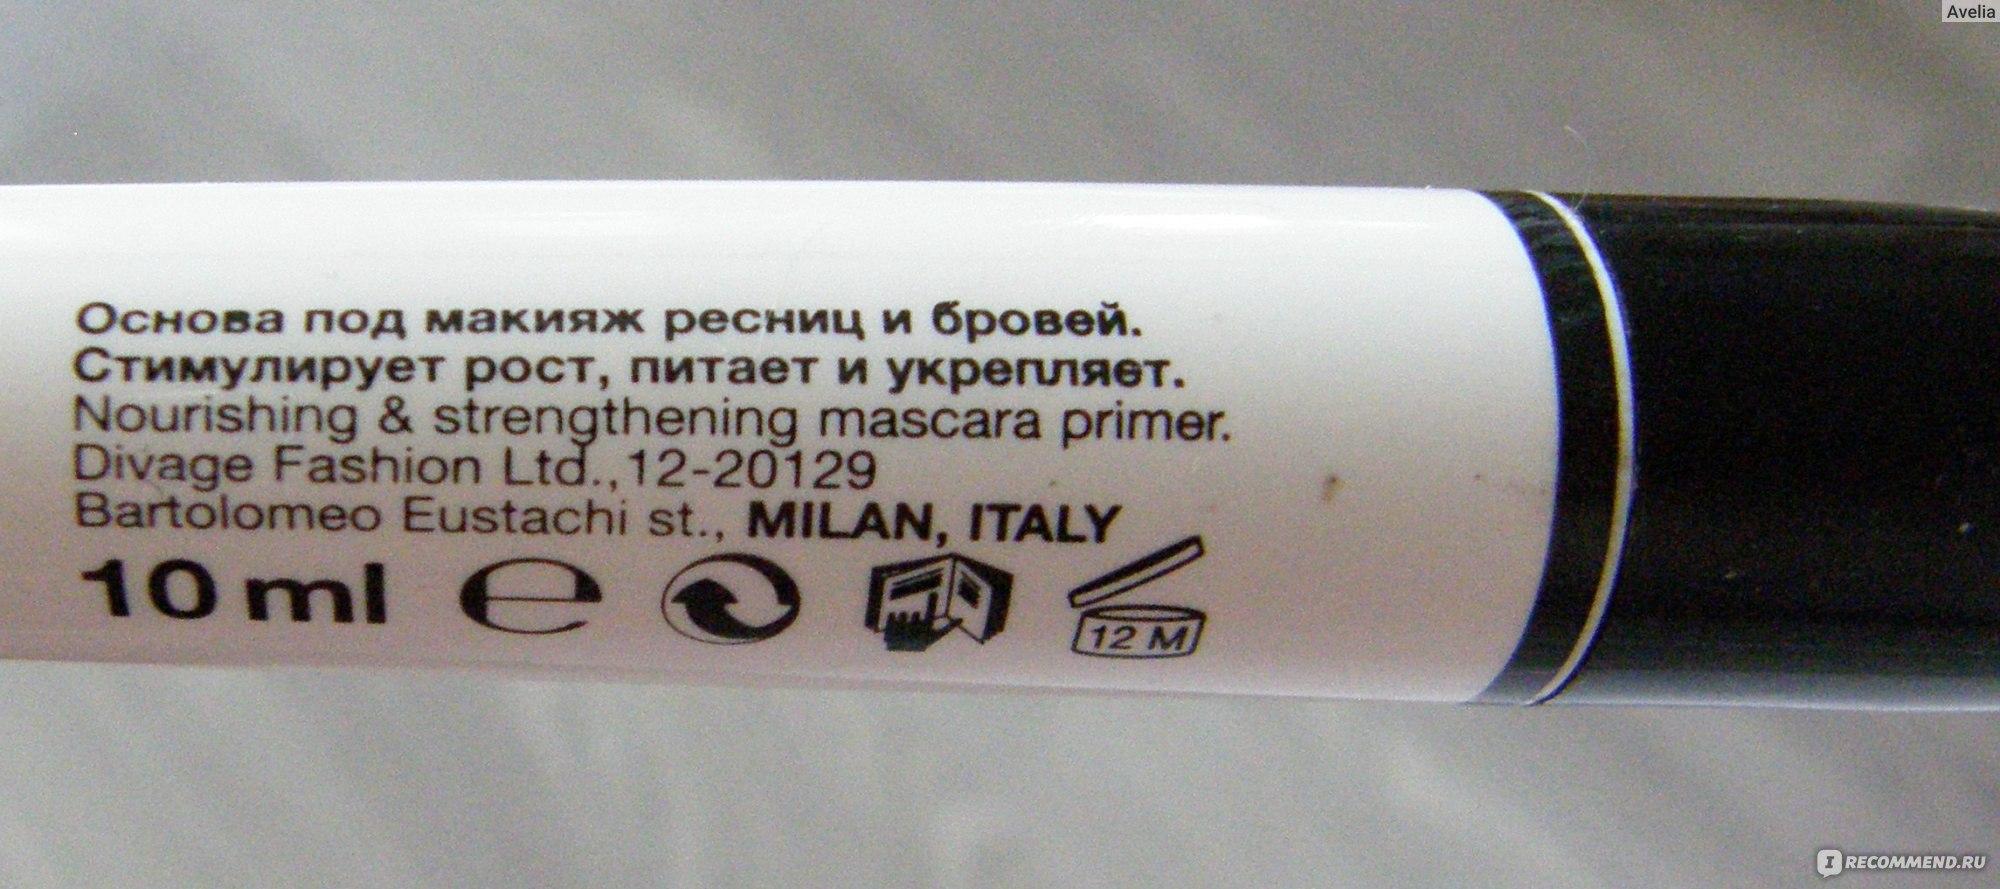 Divage основа под макияж